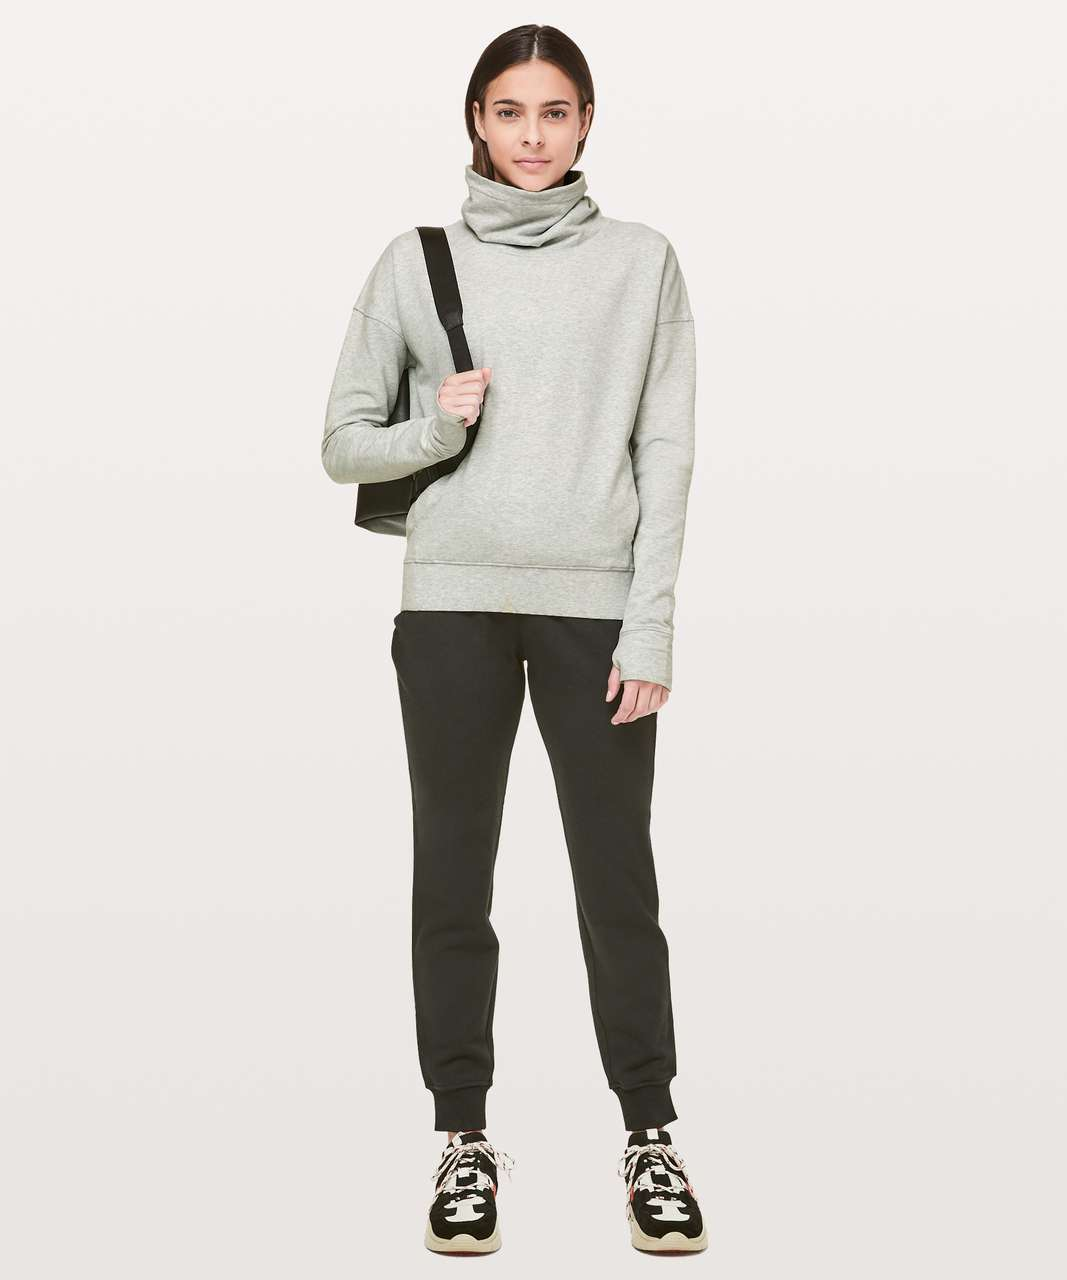 Lululemon Go Forward Pullover - Heathered Core Ultra Light Grey